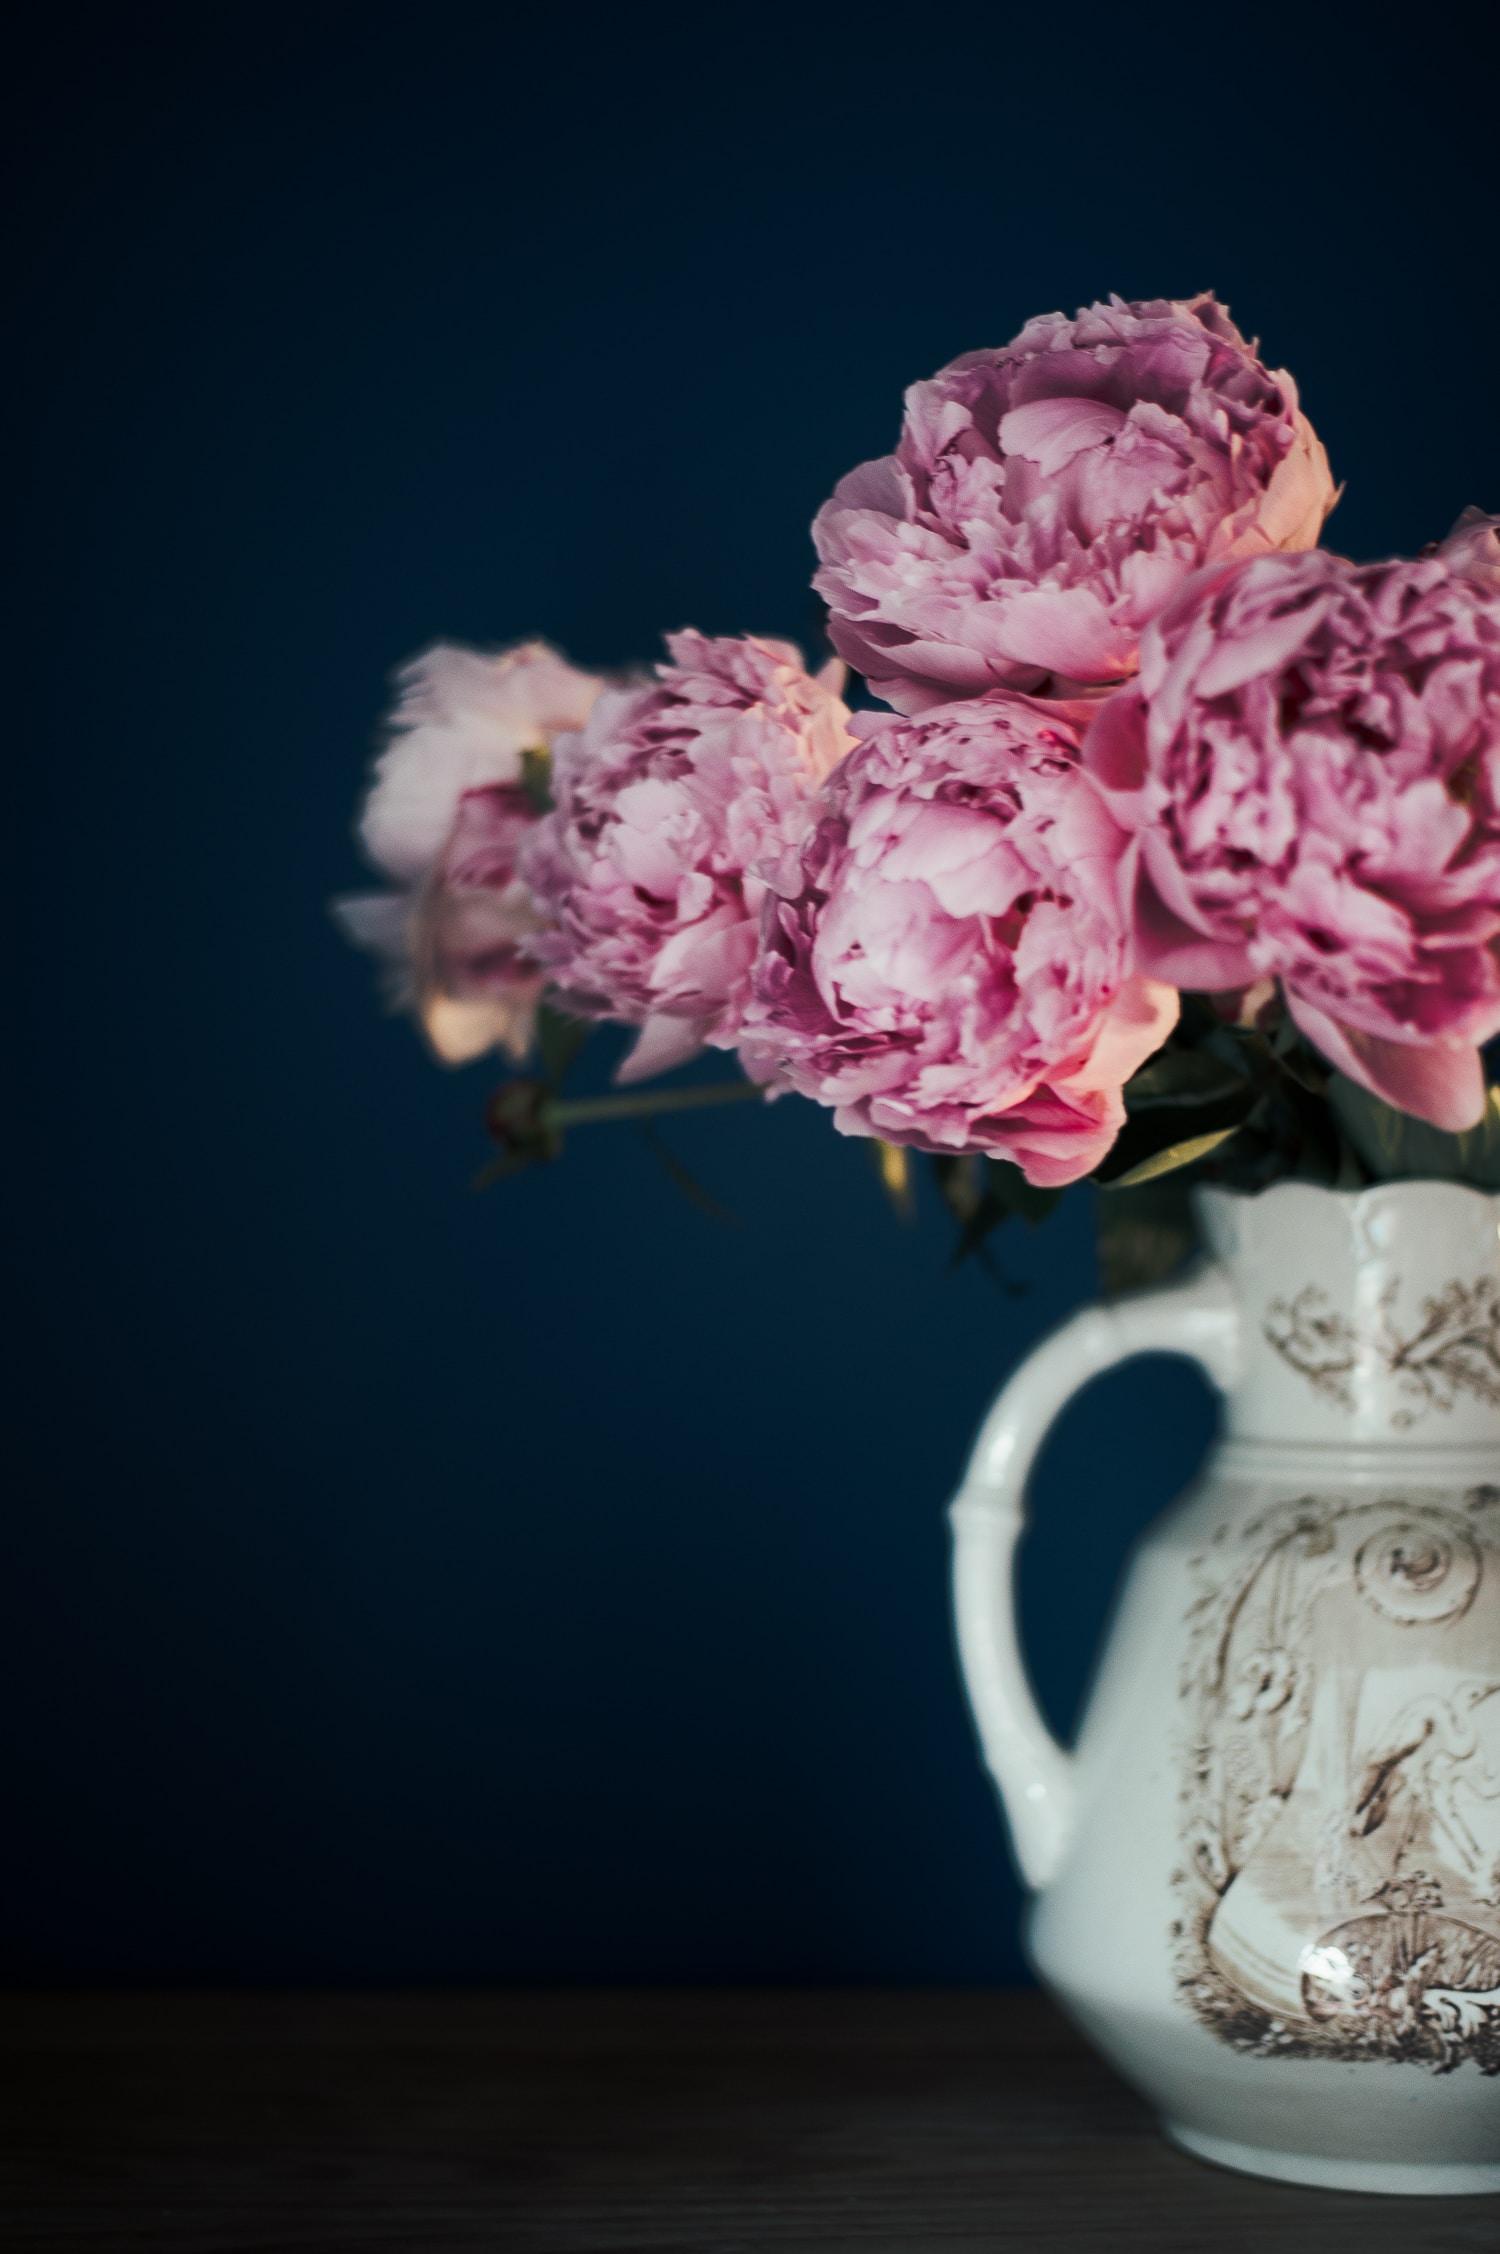 pink flower on white pitcher